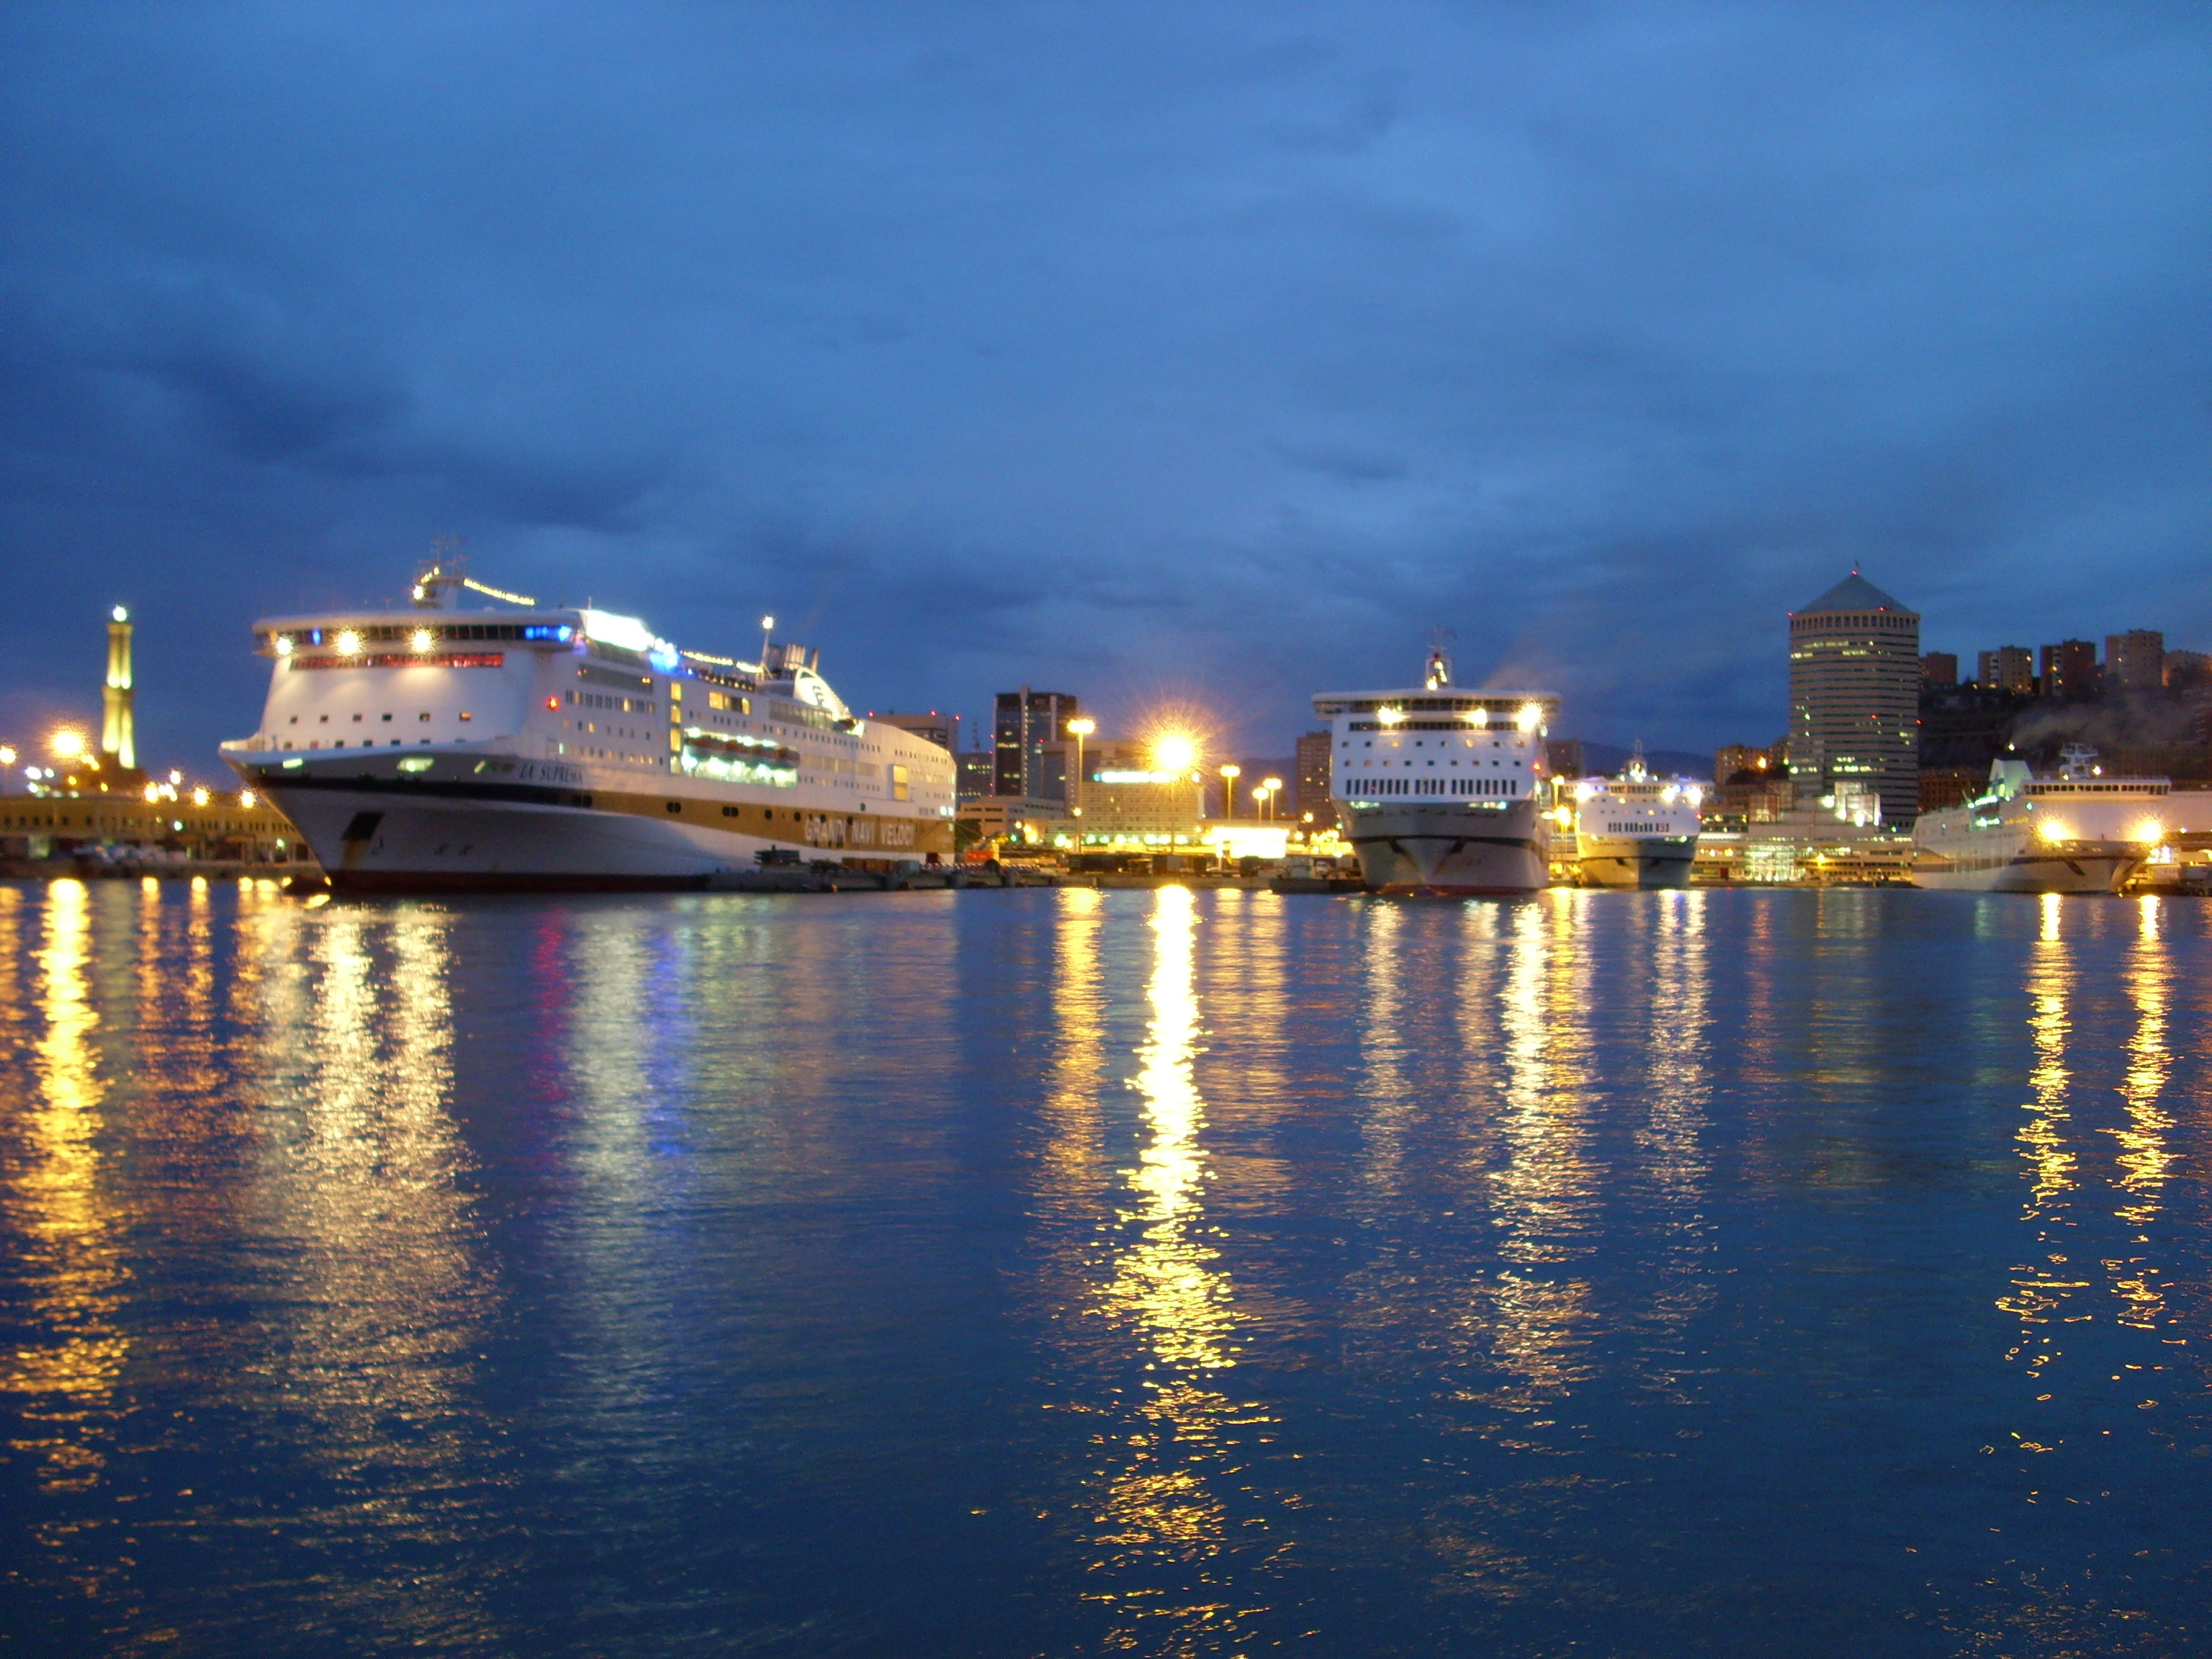 Porto Genova Notte 01.jpg